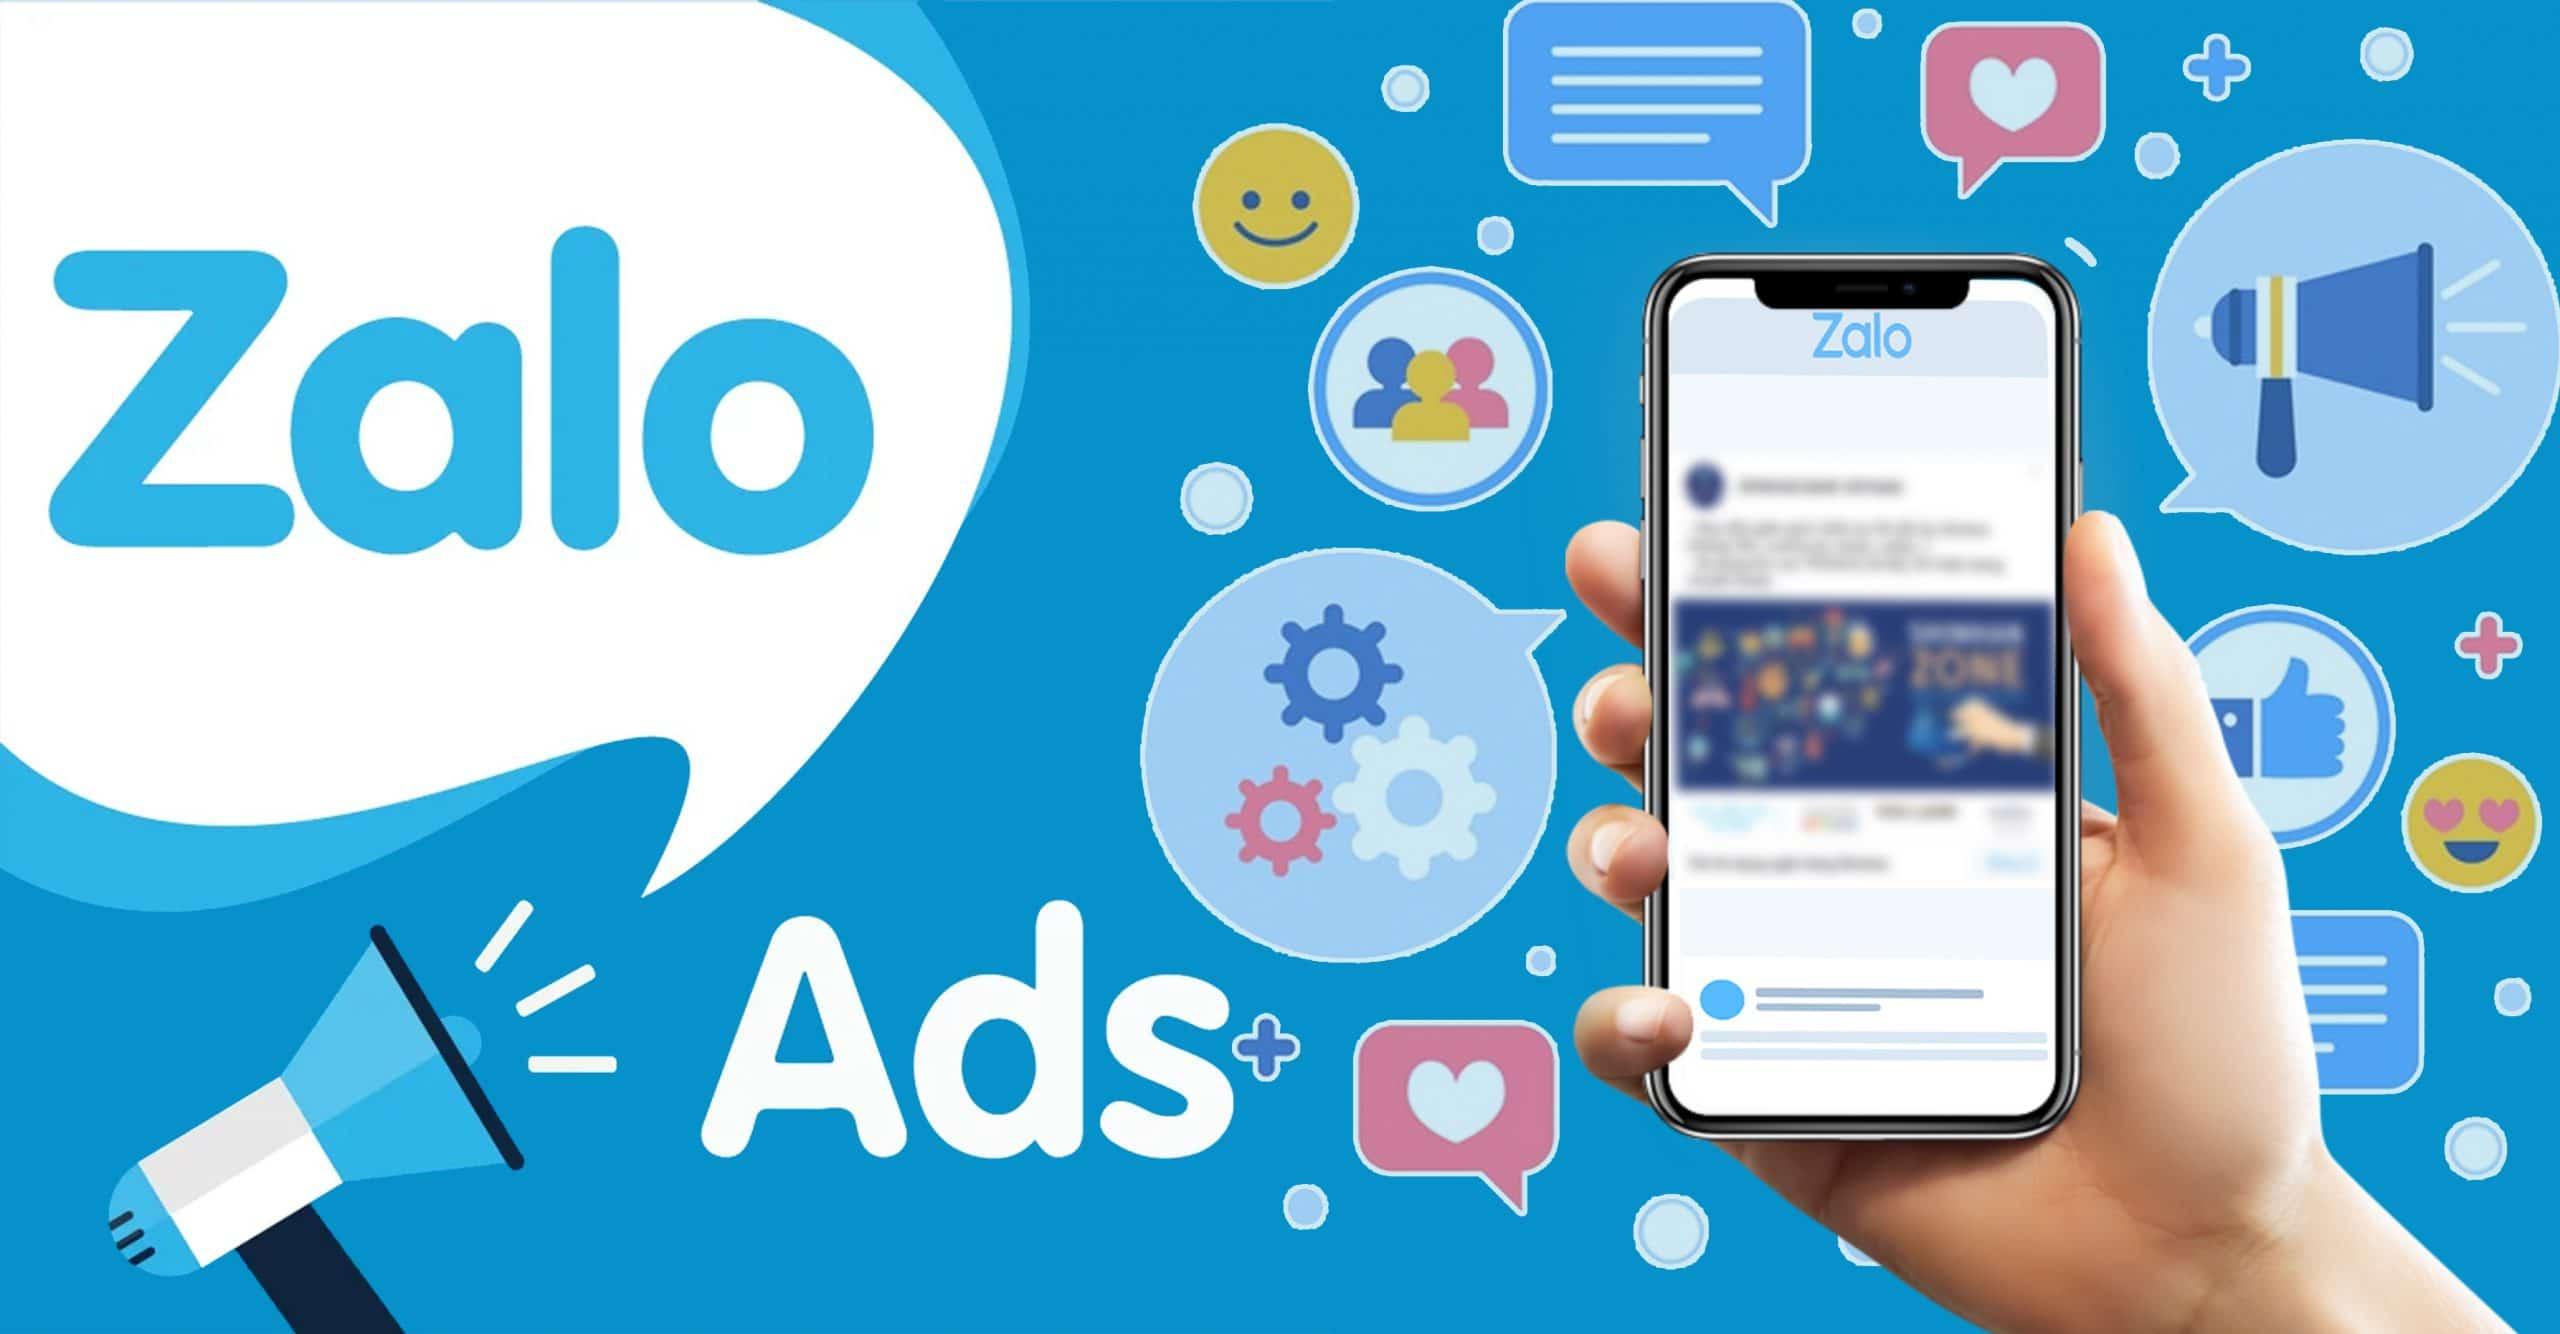 Marketer ứng phó những thay đổi lớn của iOS14 với Facebook ra sao? markeitngreview.vn 2